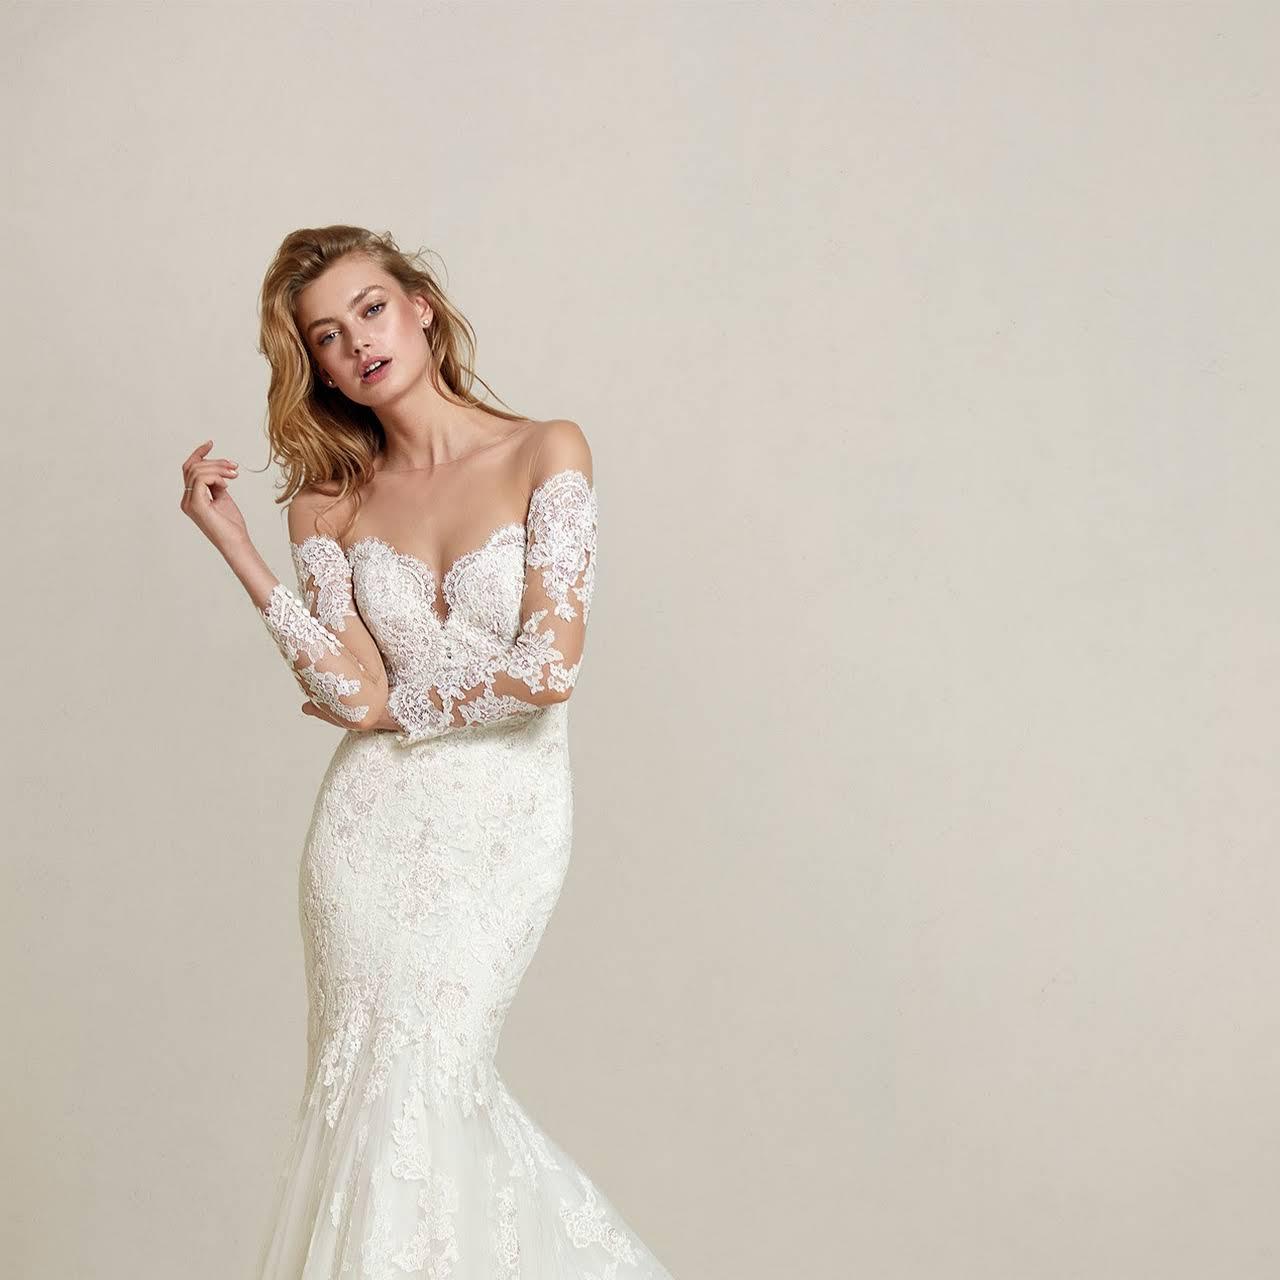 5673e3761c1 Leila Haute Couture - Montreal Wedding Dresses   Evening Dresses ...